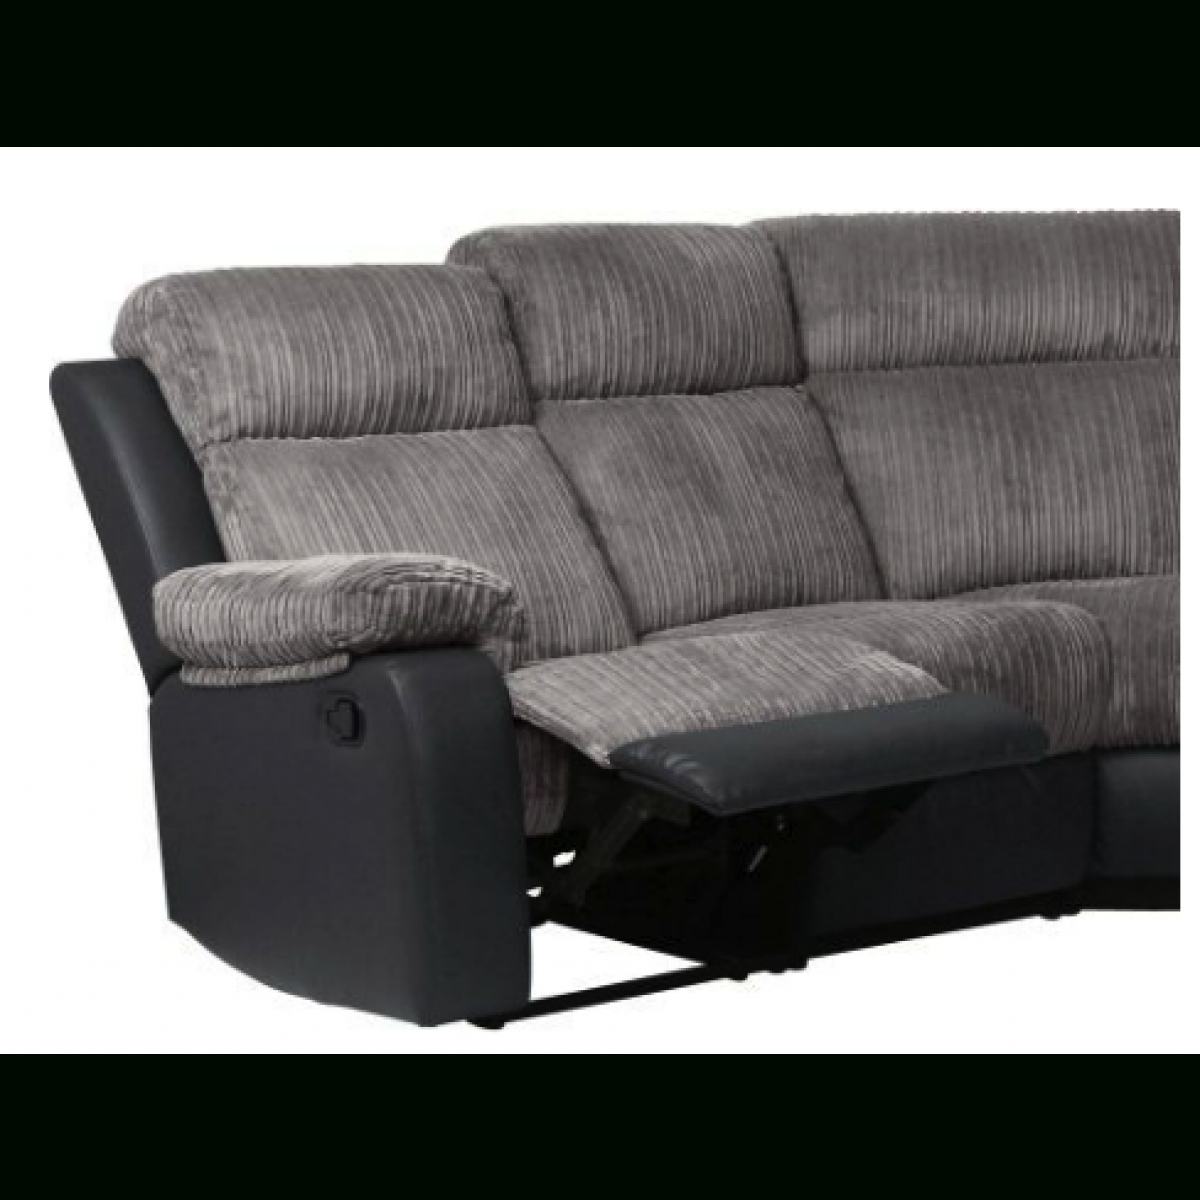 corner sofa bed recliner wayfair sofas canada 20 collection of fabric ideas